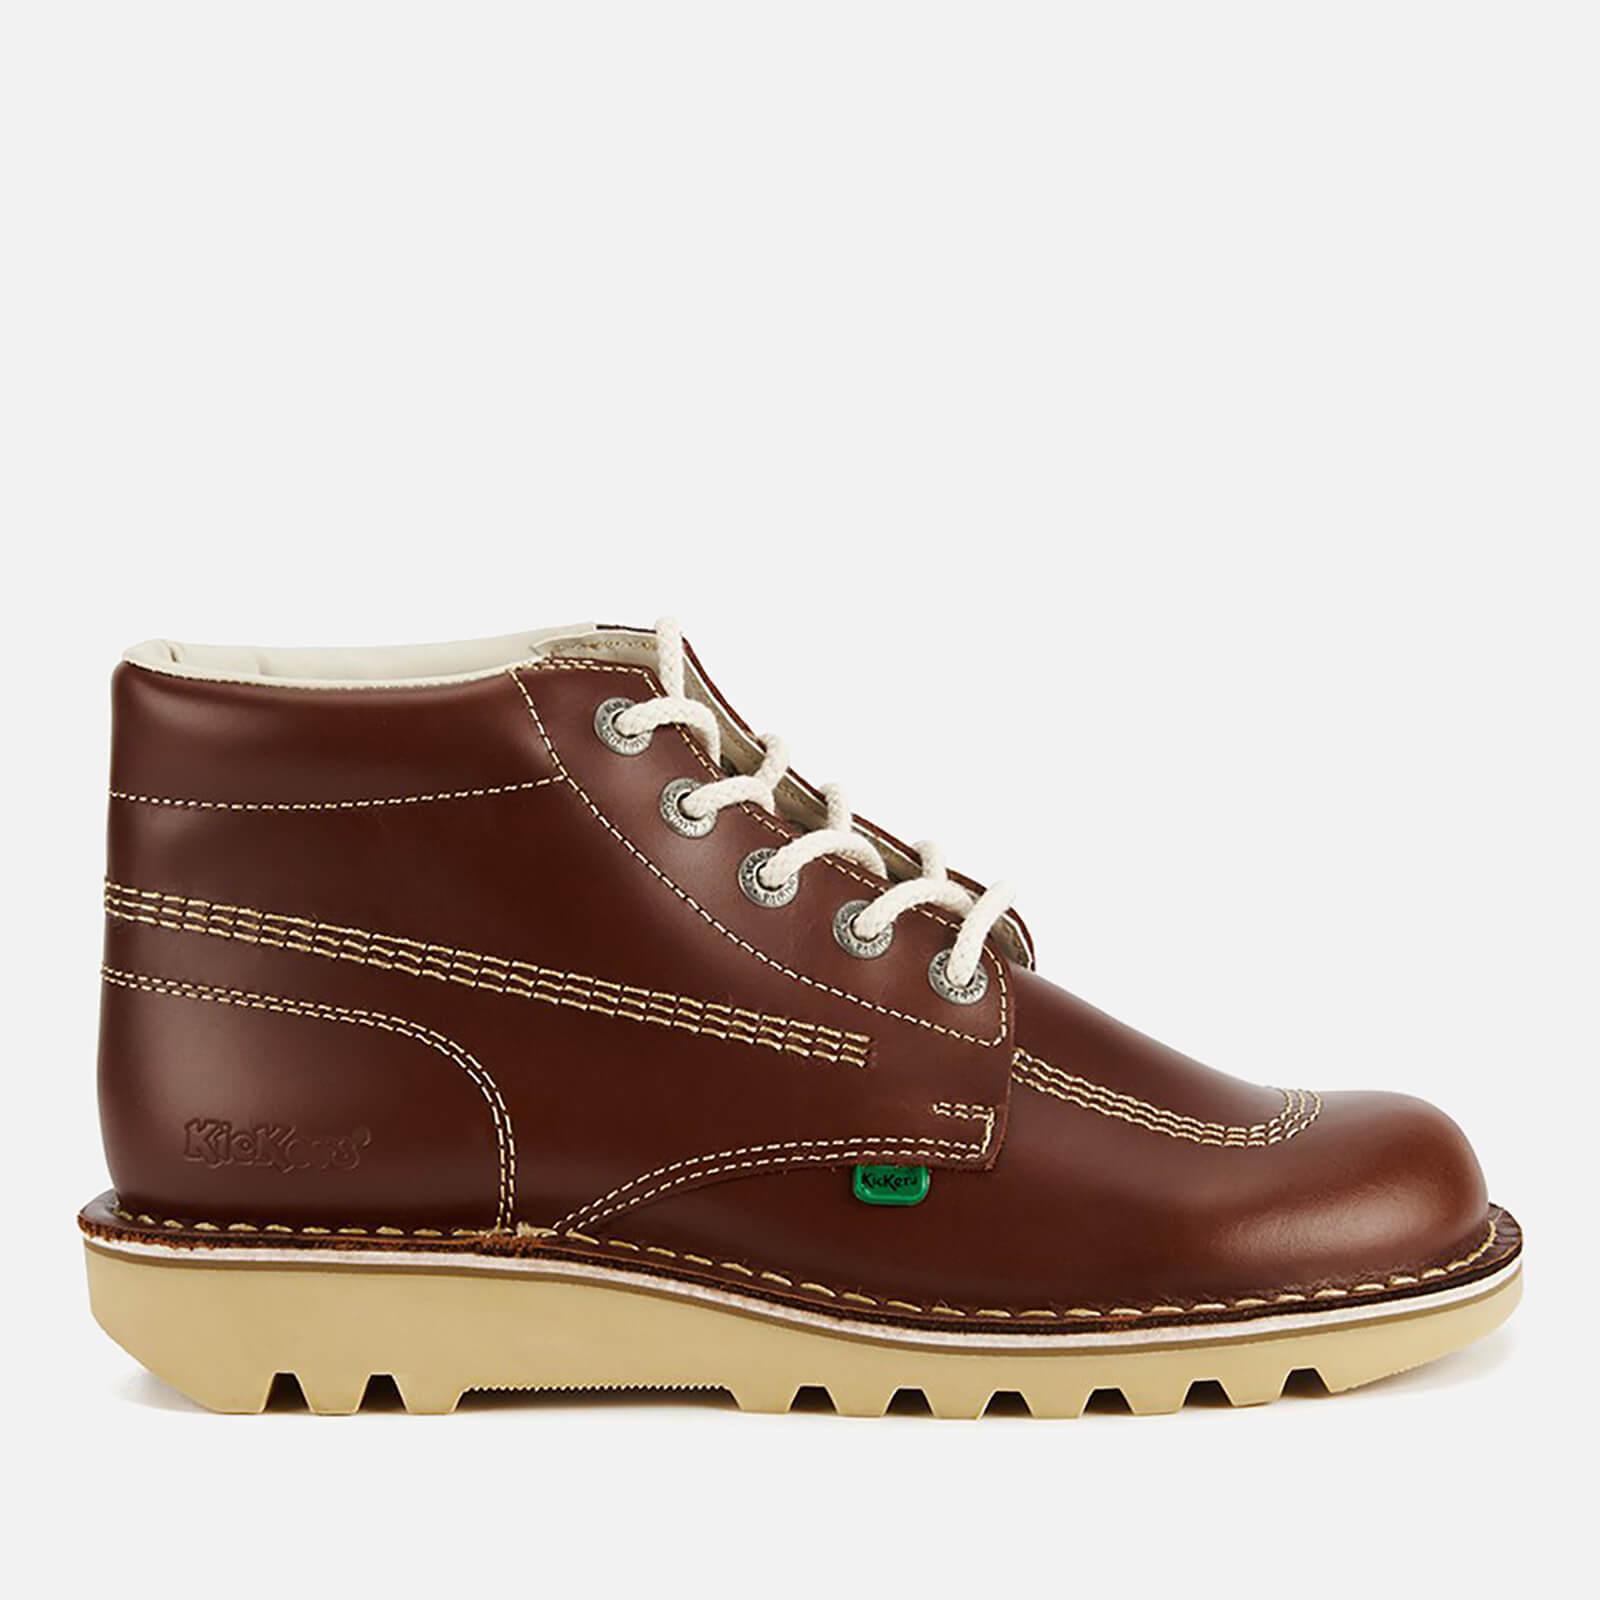 de7dc418bb Kickers Men s Kick Hi Leather Boots - Dark Tan Mens Footwear ...